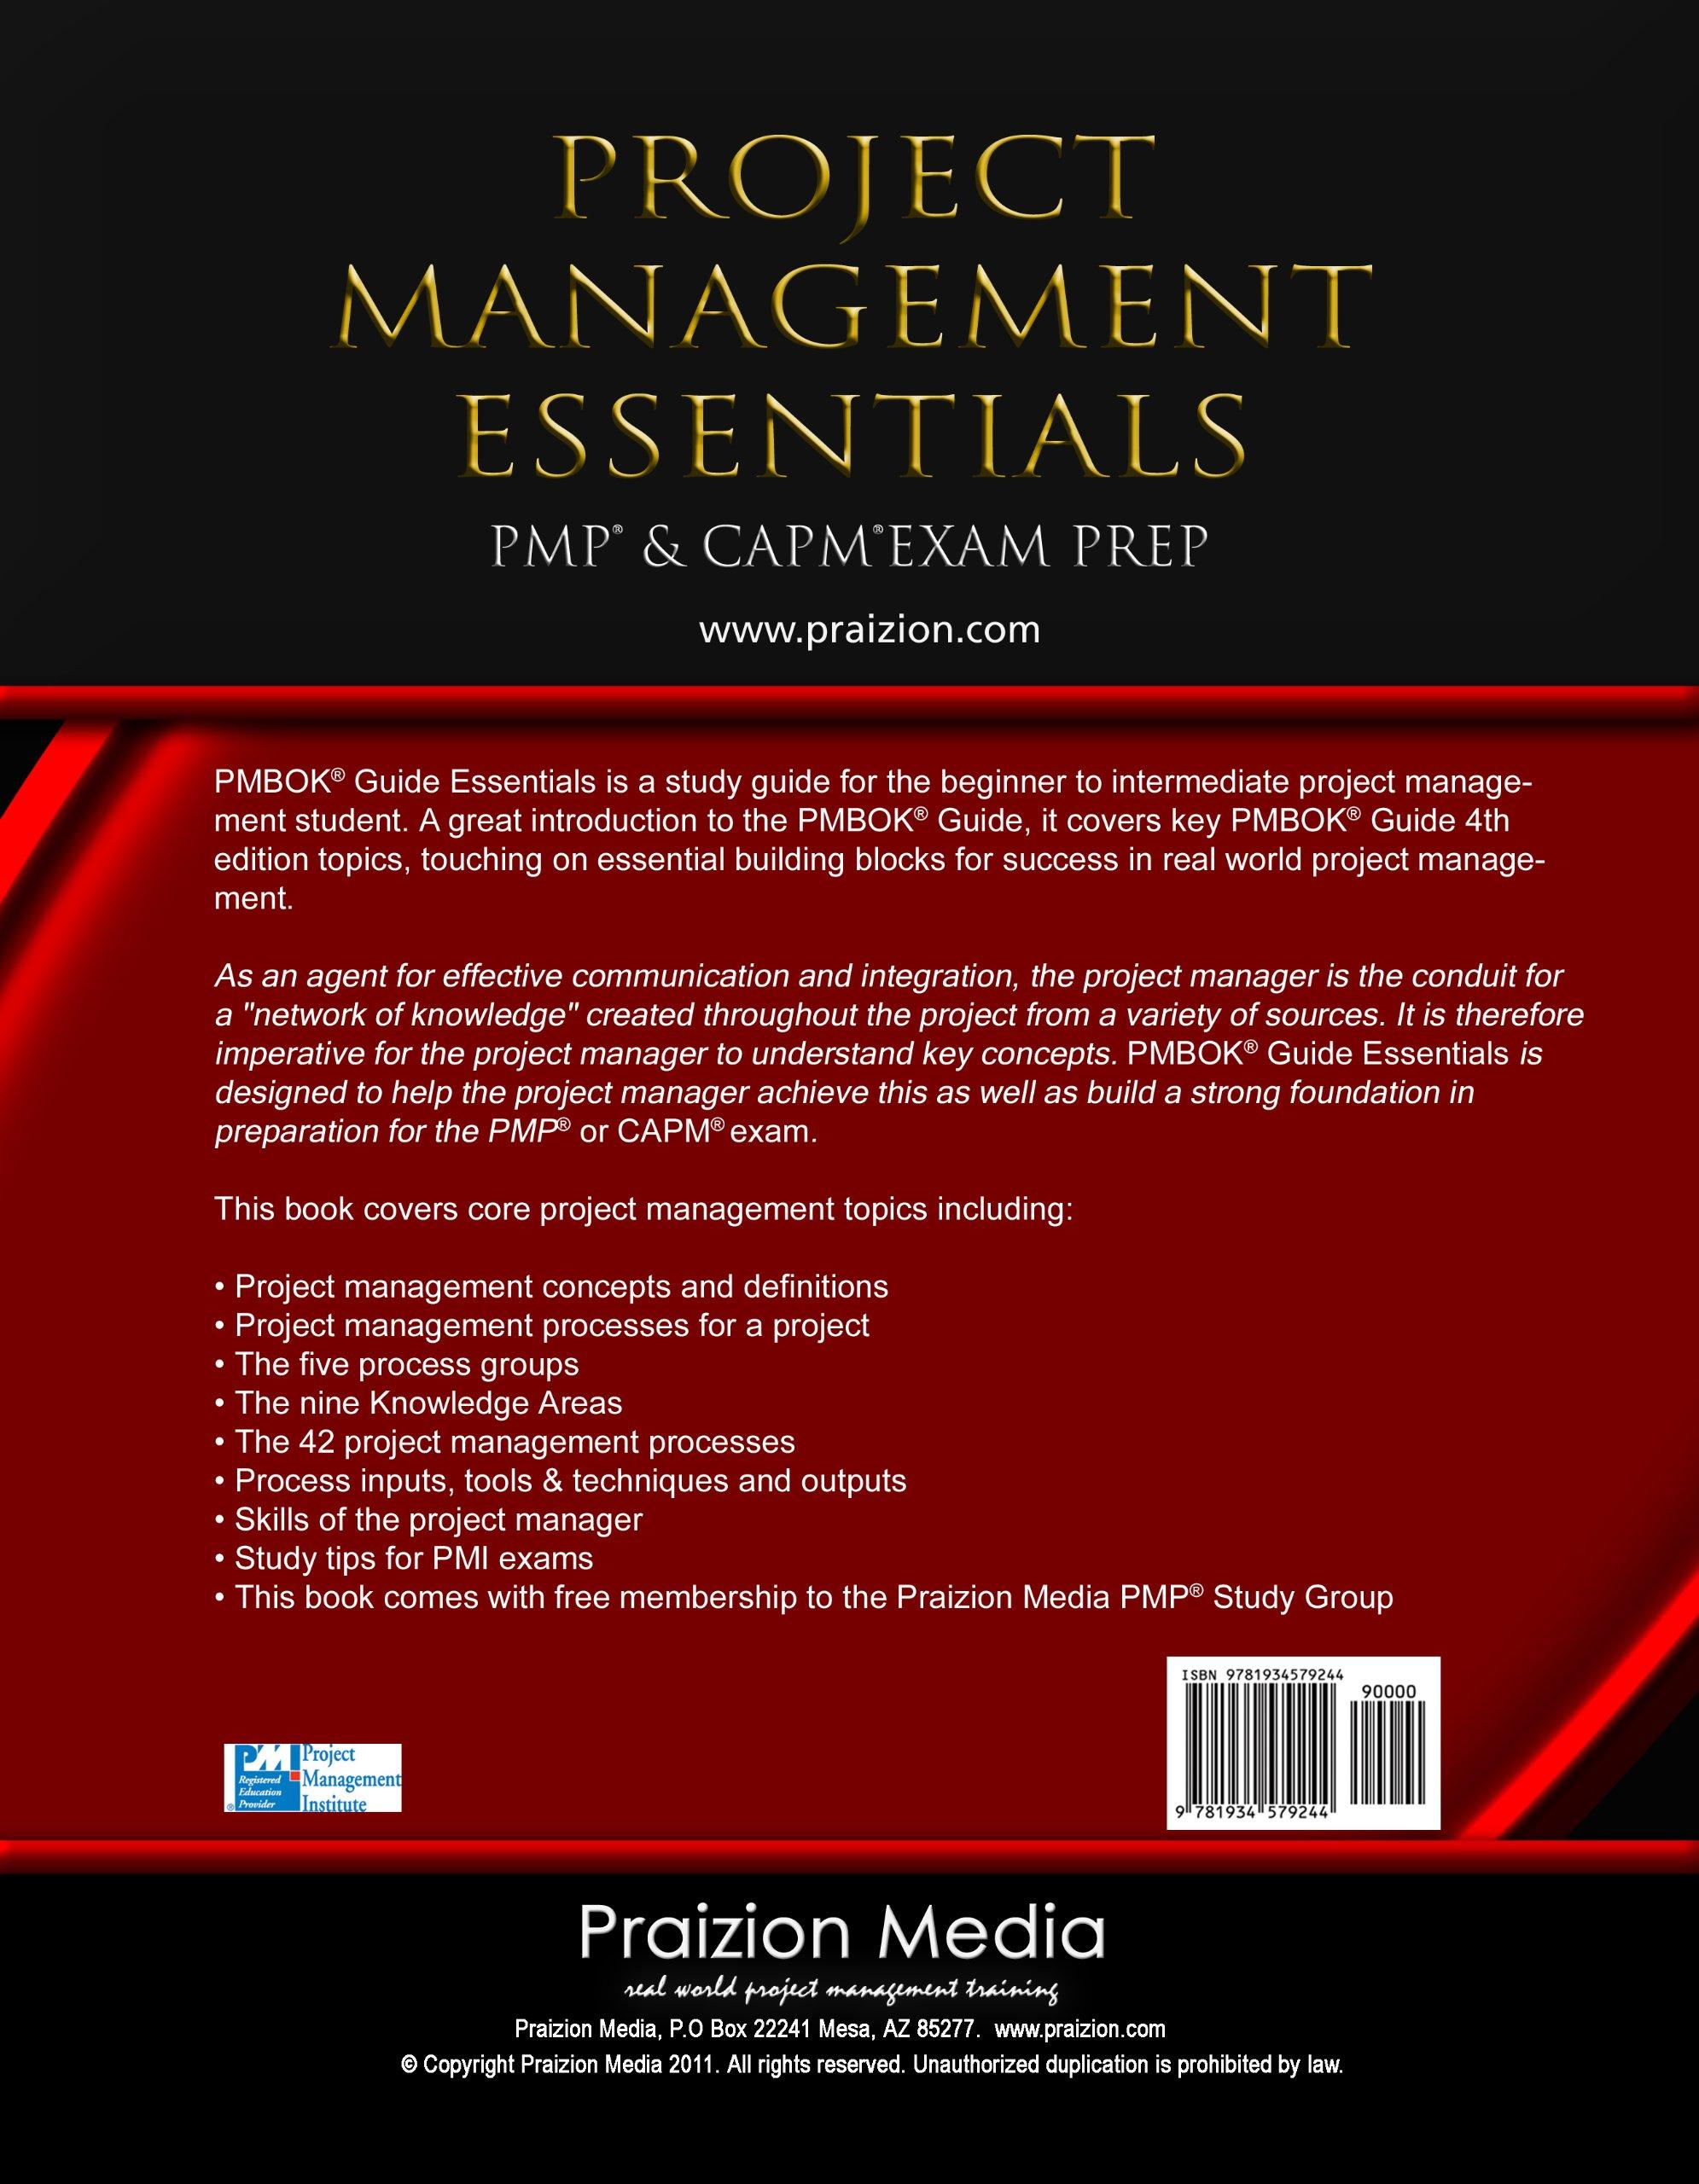 Project management essentials pmp capm exam study guide 4th project management essentials pmp capm exam study guide 4th edition praizion media 9781934579244 amazon books 1betcityfo Choice Image